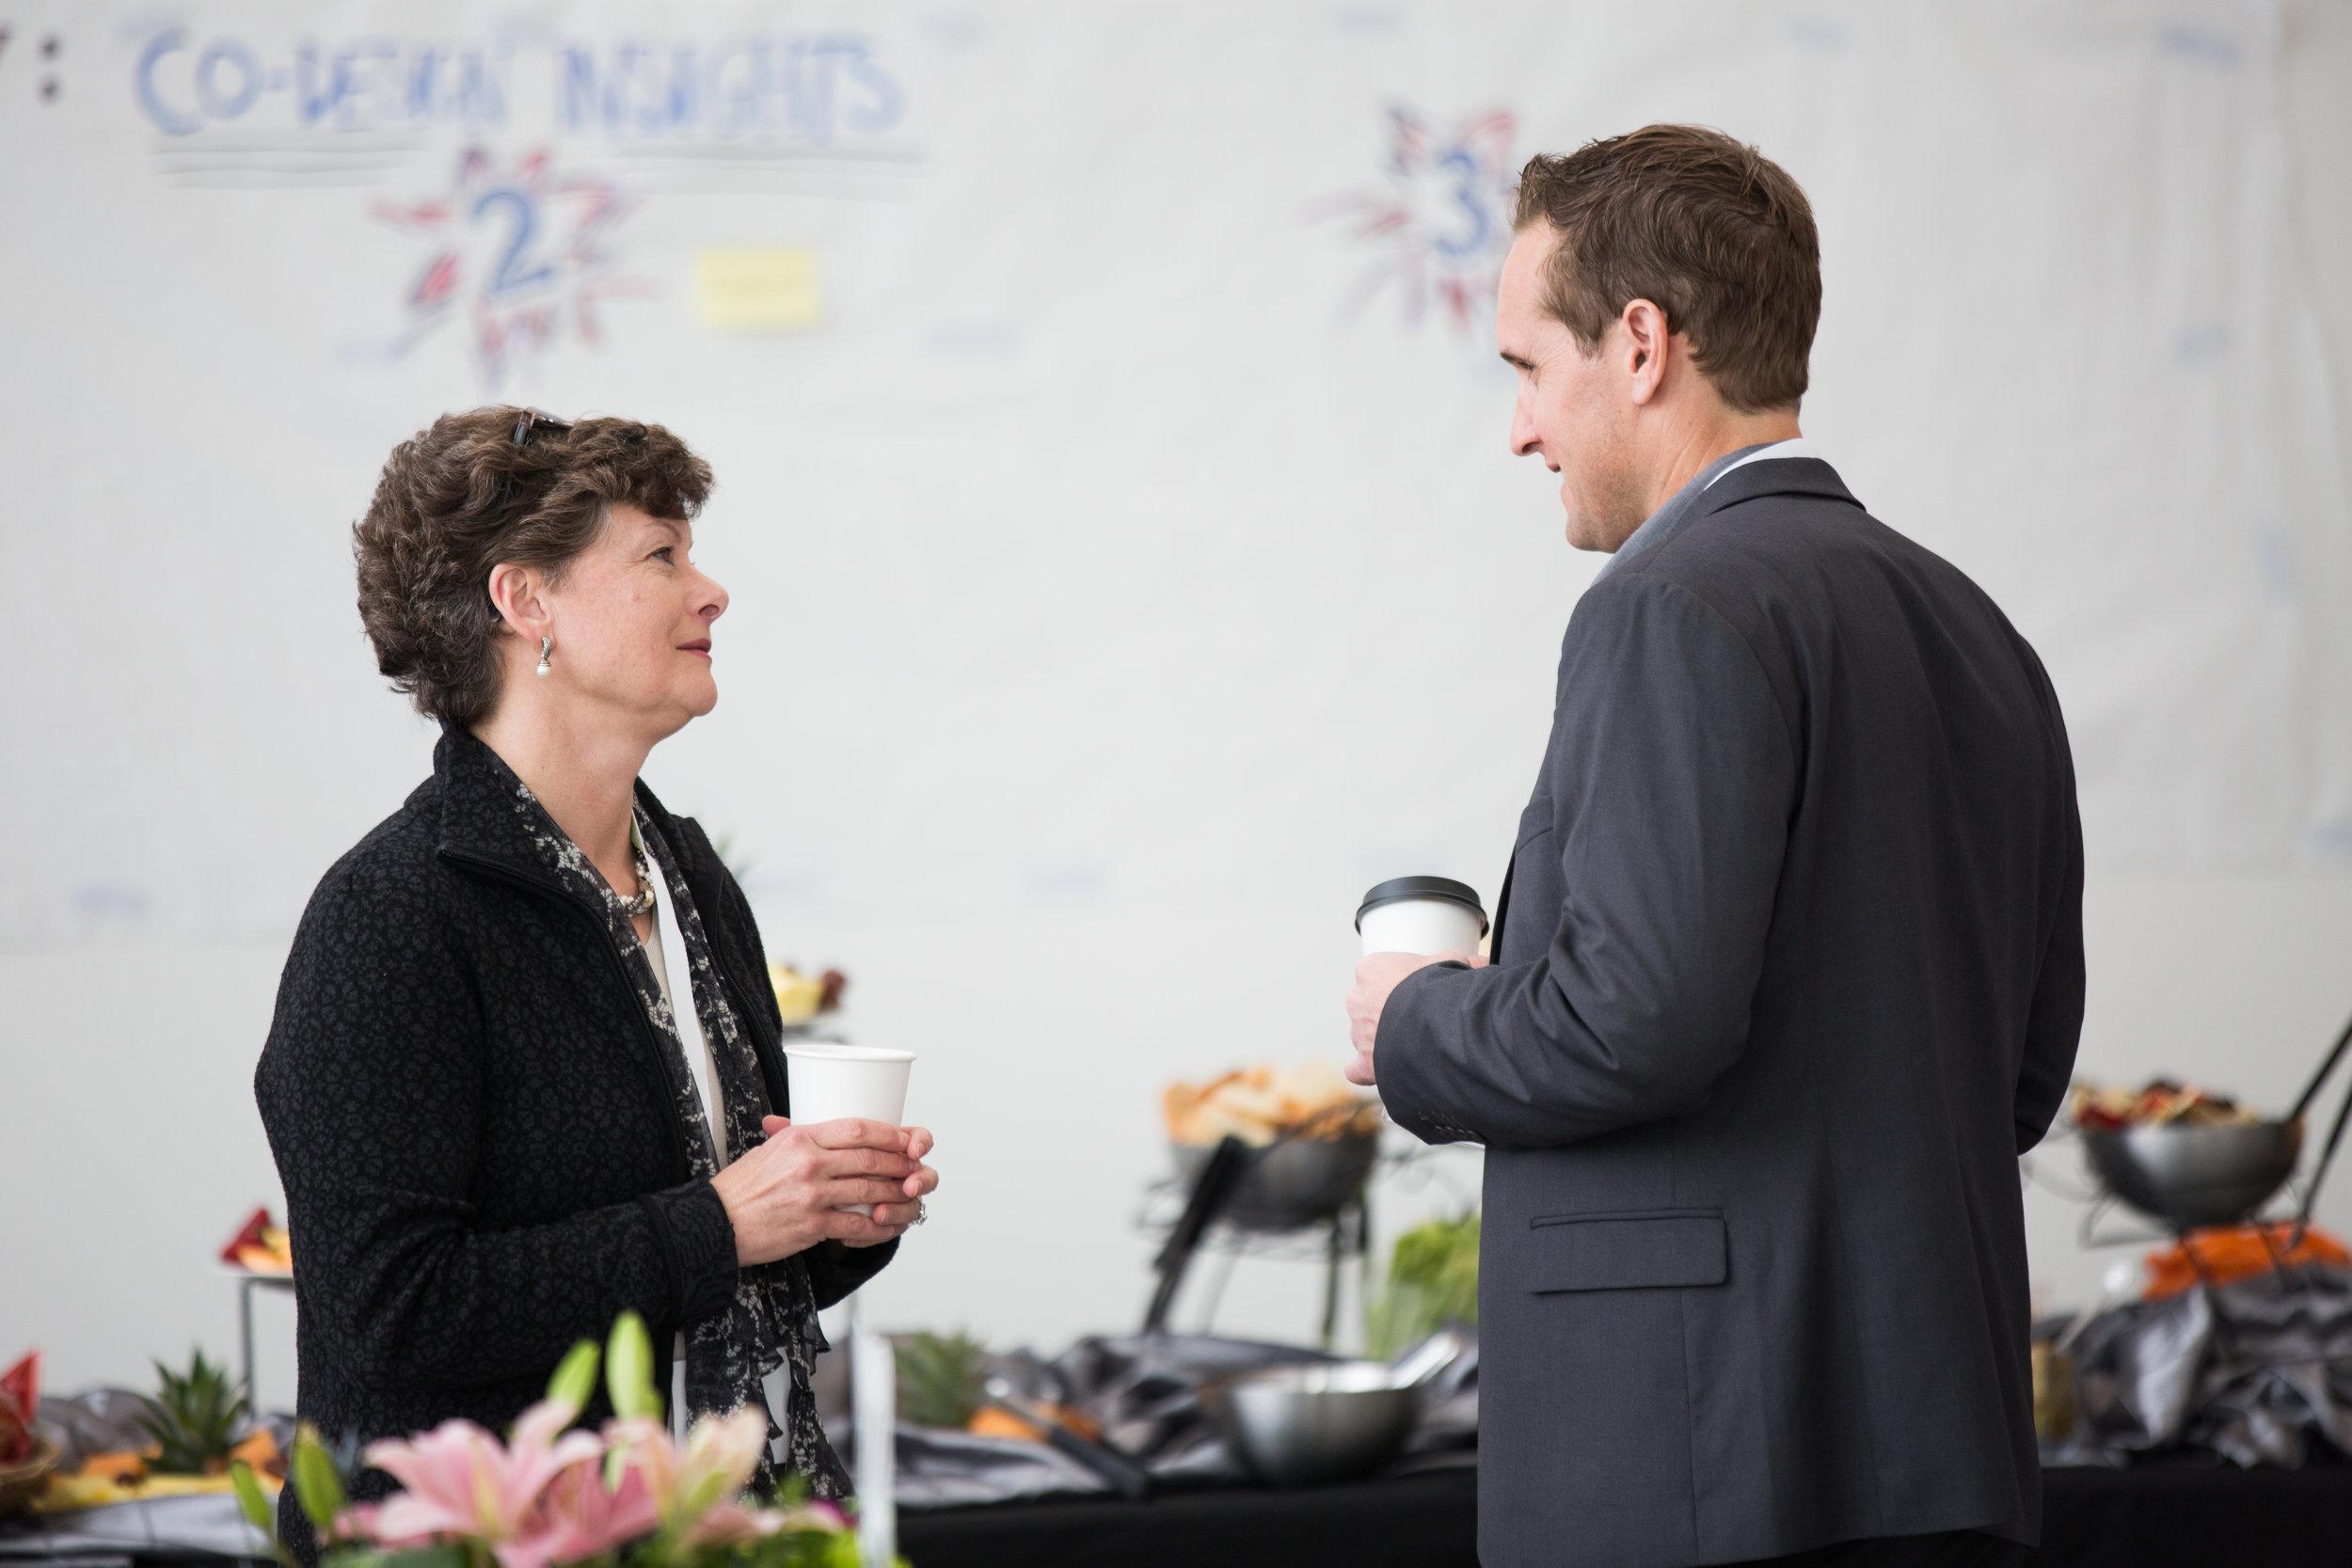 Jenny Whitener and Darren Reinke